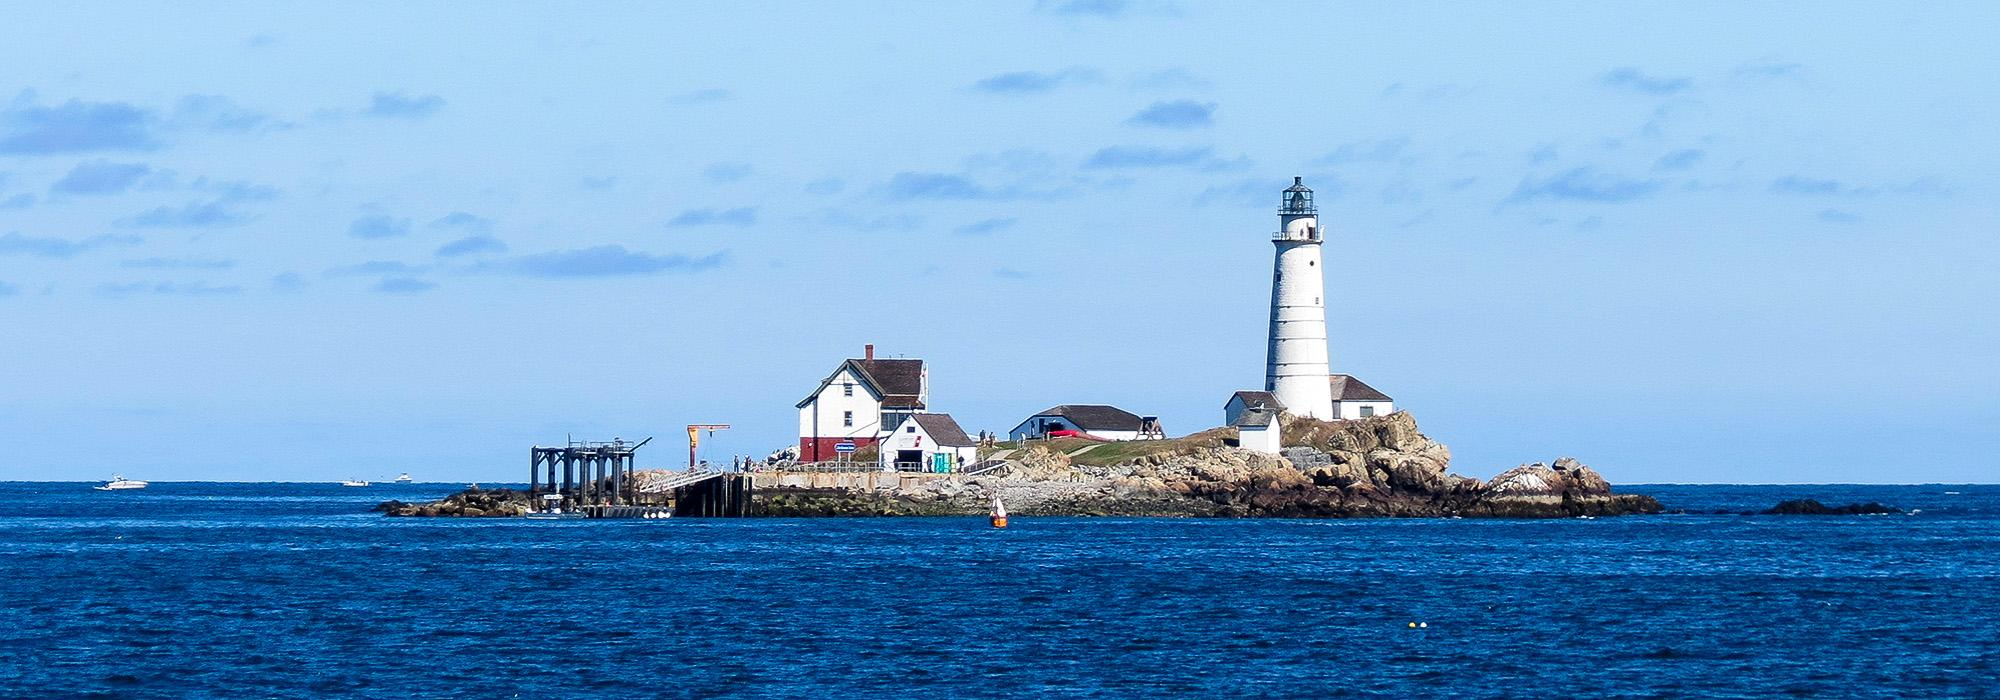 BostonLight_hero_RobertLinsdell_Wikimedia_2013_03.jpg